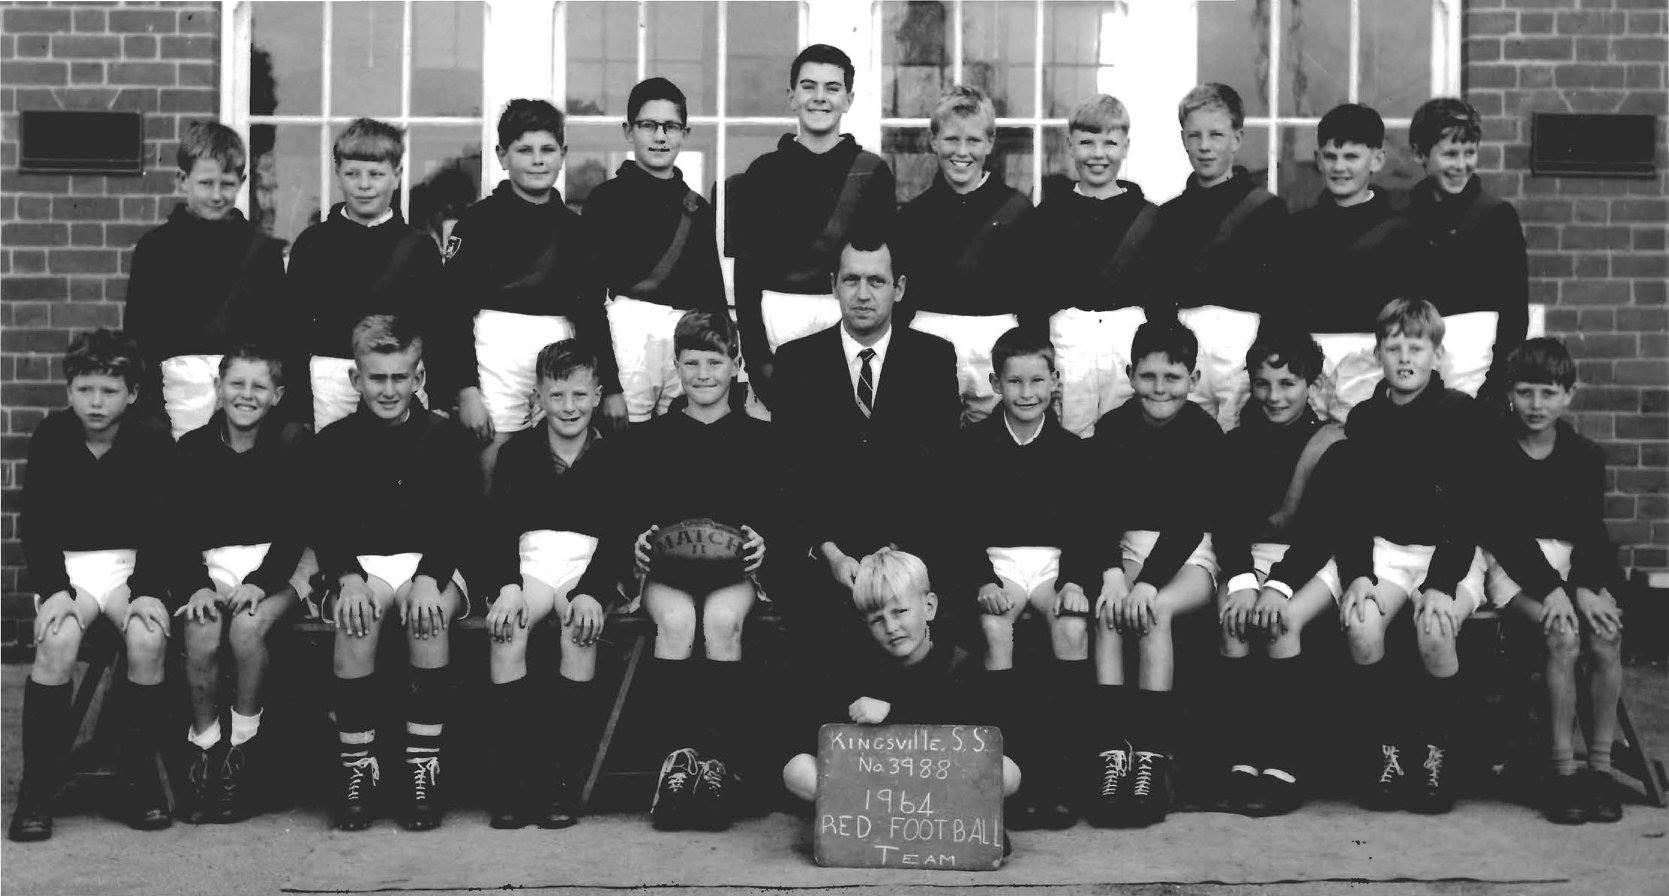 School football team, 1964